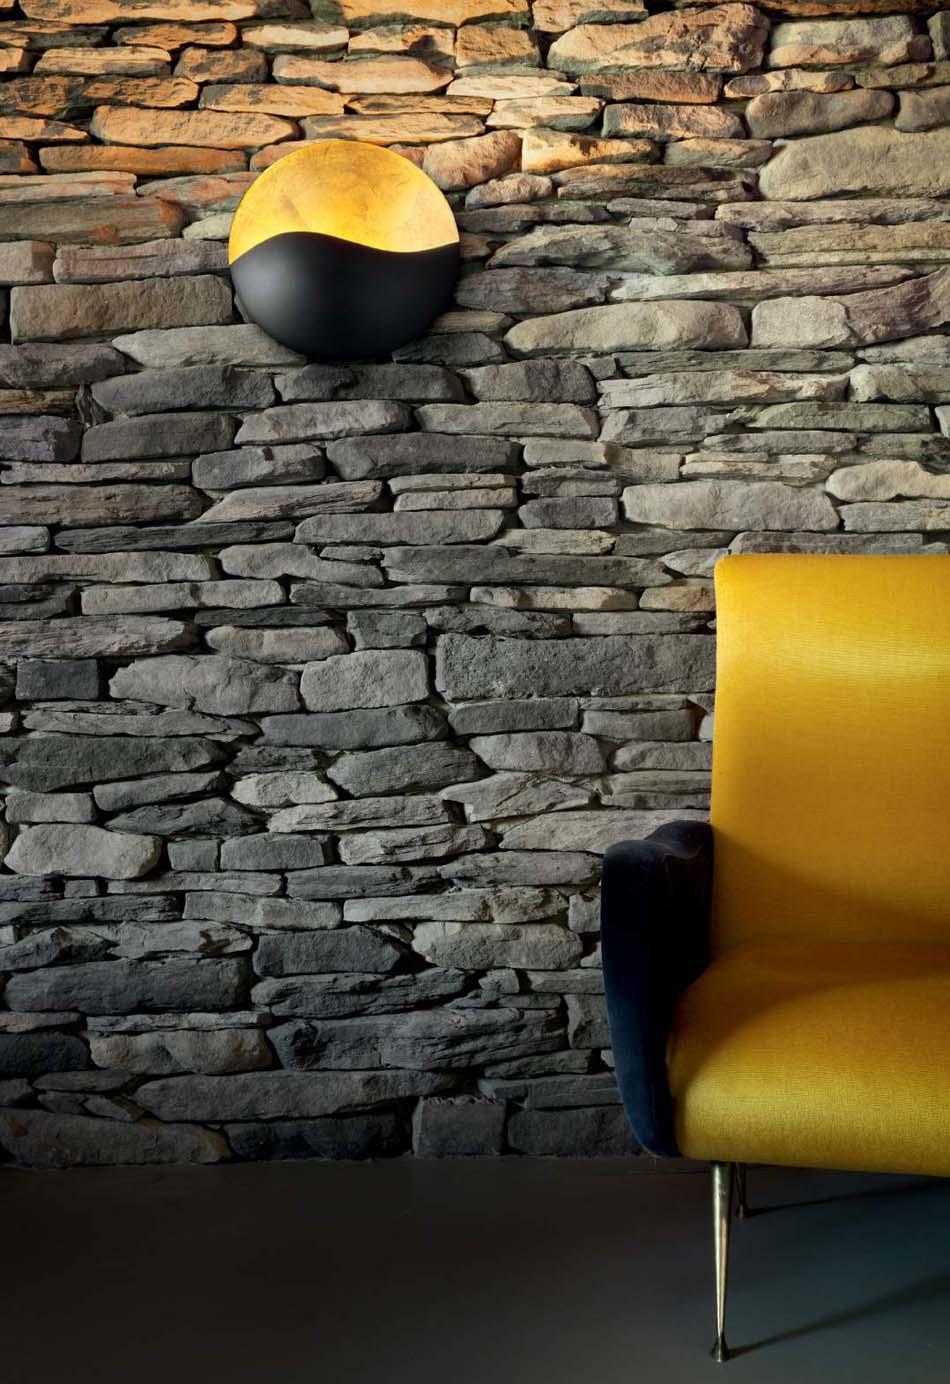 Lampade 45 soffitto parete Ideal Lux sunset – Toscana Arredamenti